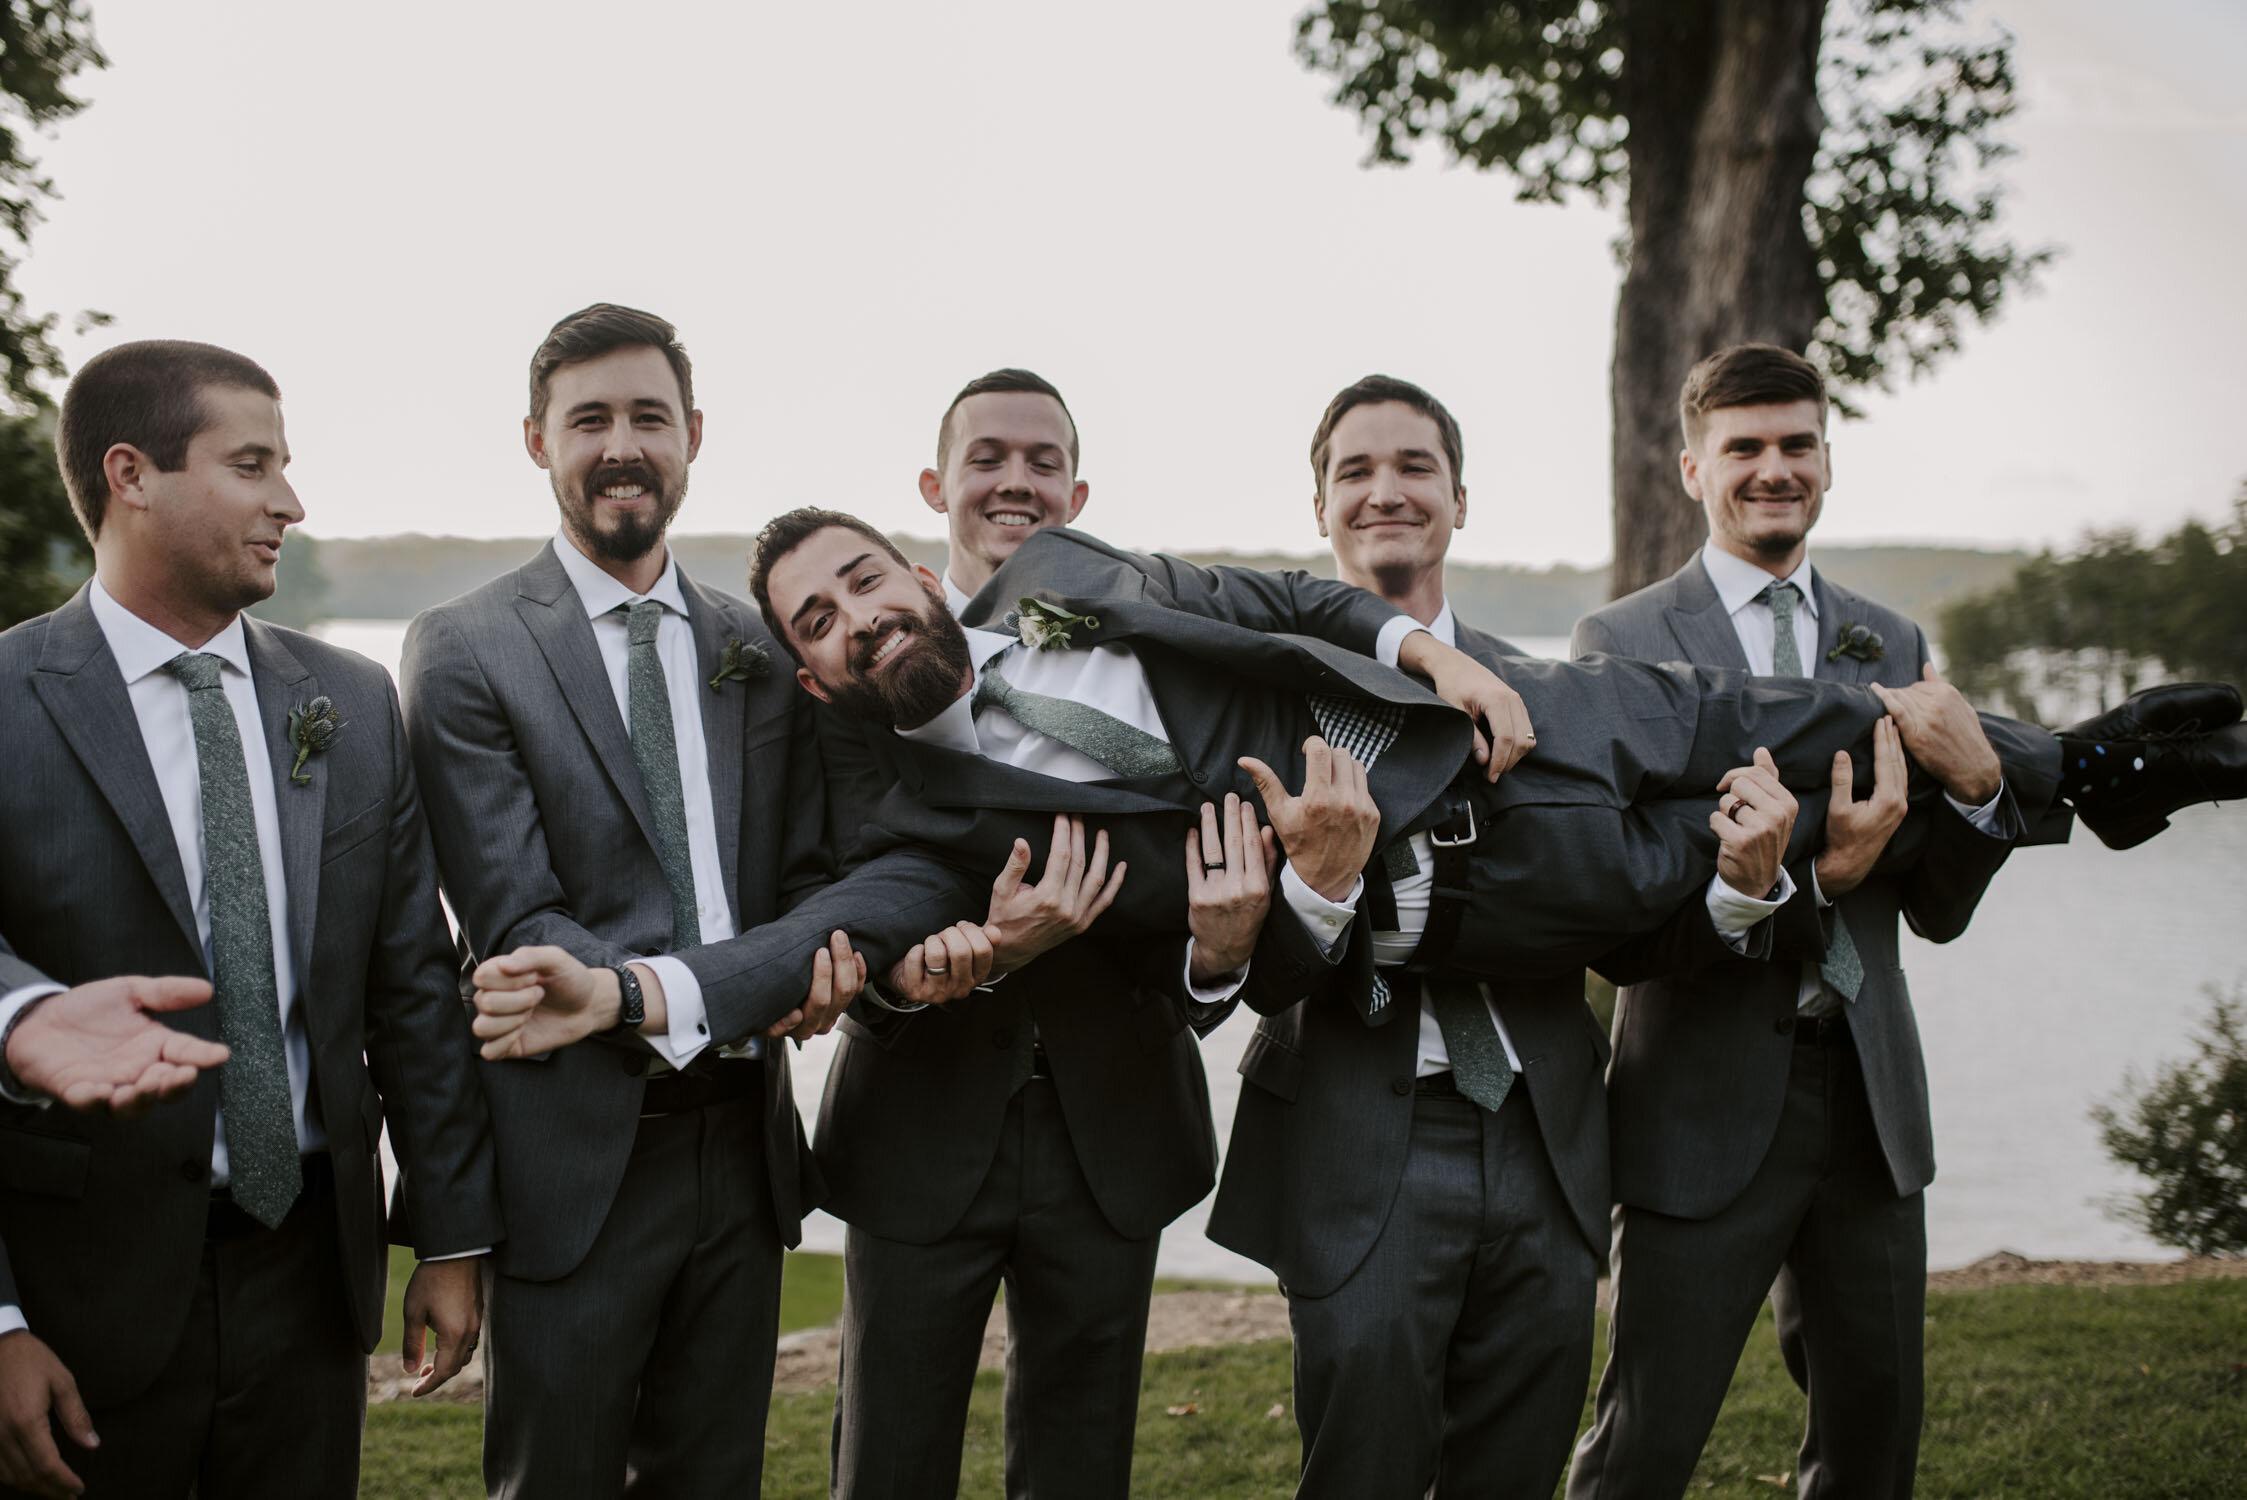 Fun groomsmen & wedding party portraits  at Bella Collina   By Greensboro, NC Wedding Photographer: Kayli LaFon Photography